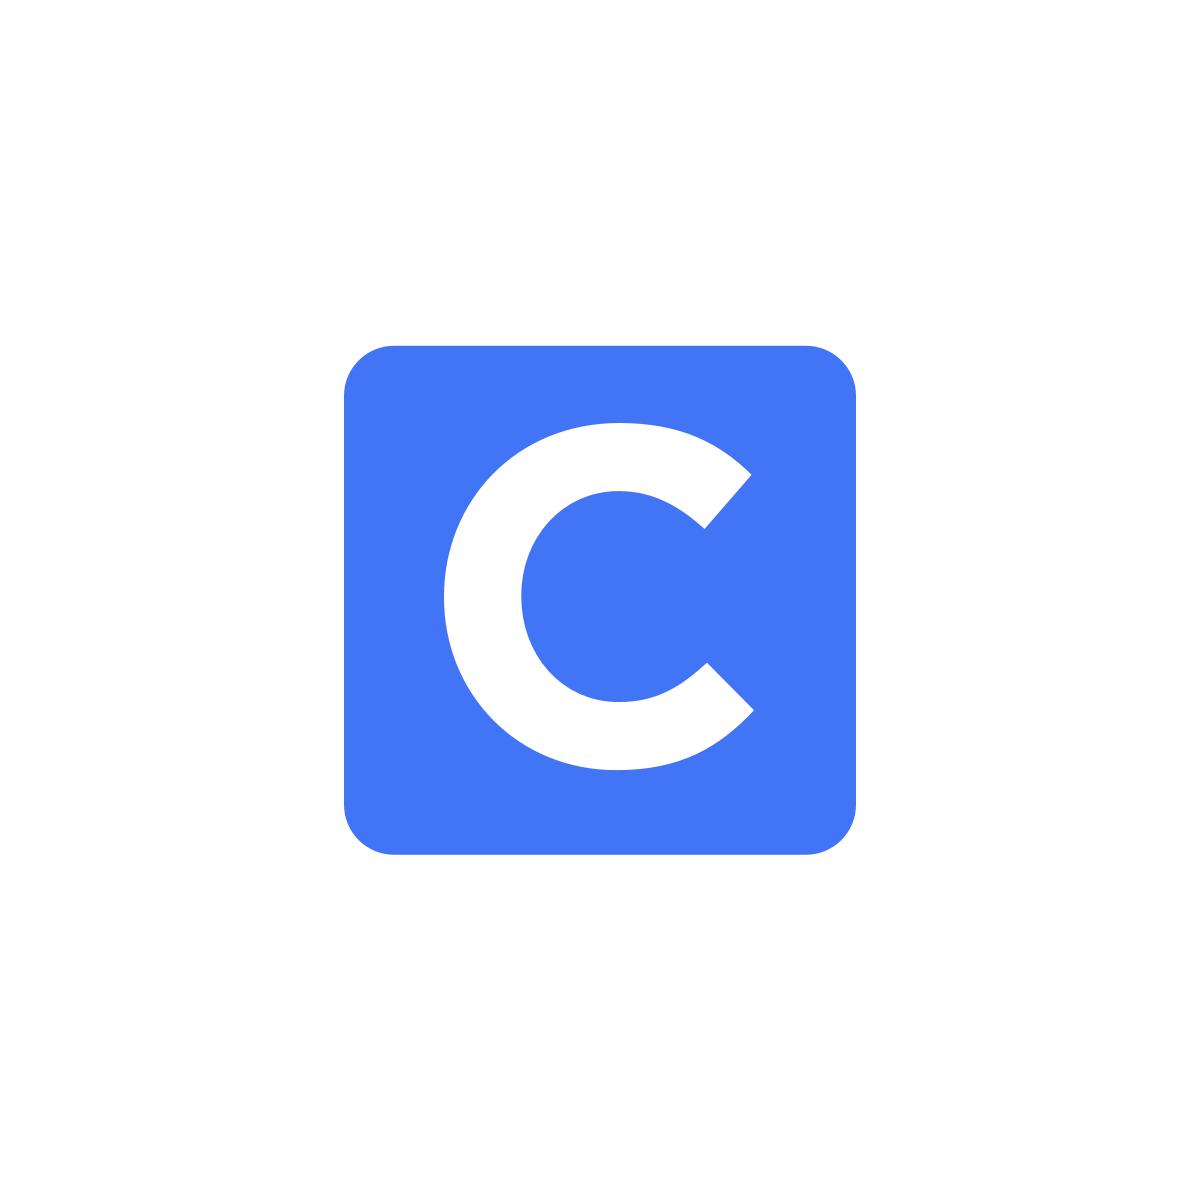 purple c clever logo